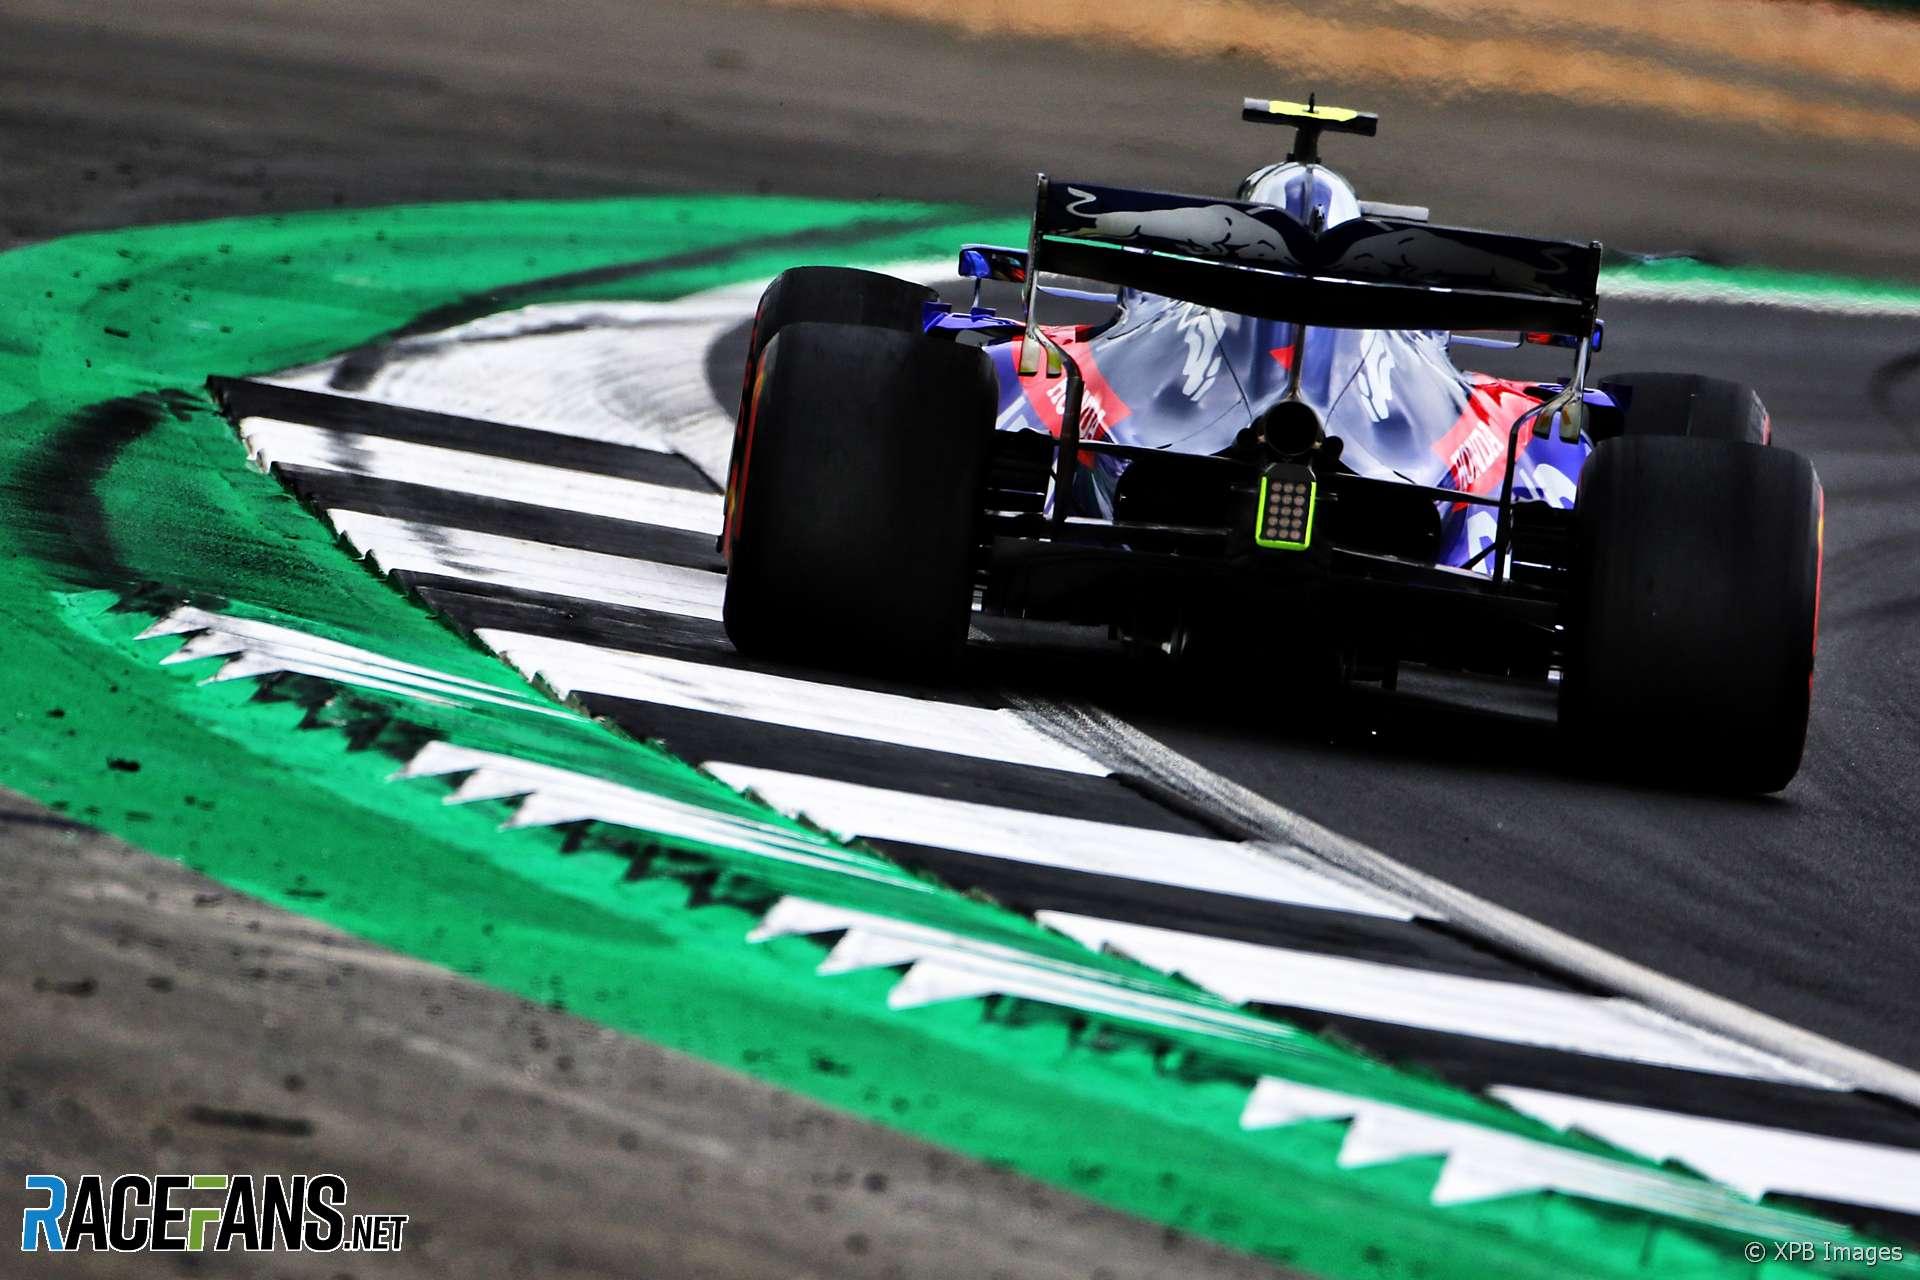 Alexander Albon, Toro Rosso, Silverstone, 2019